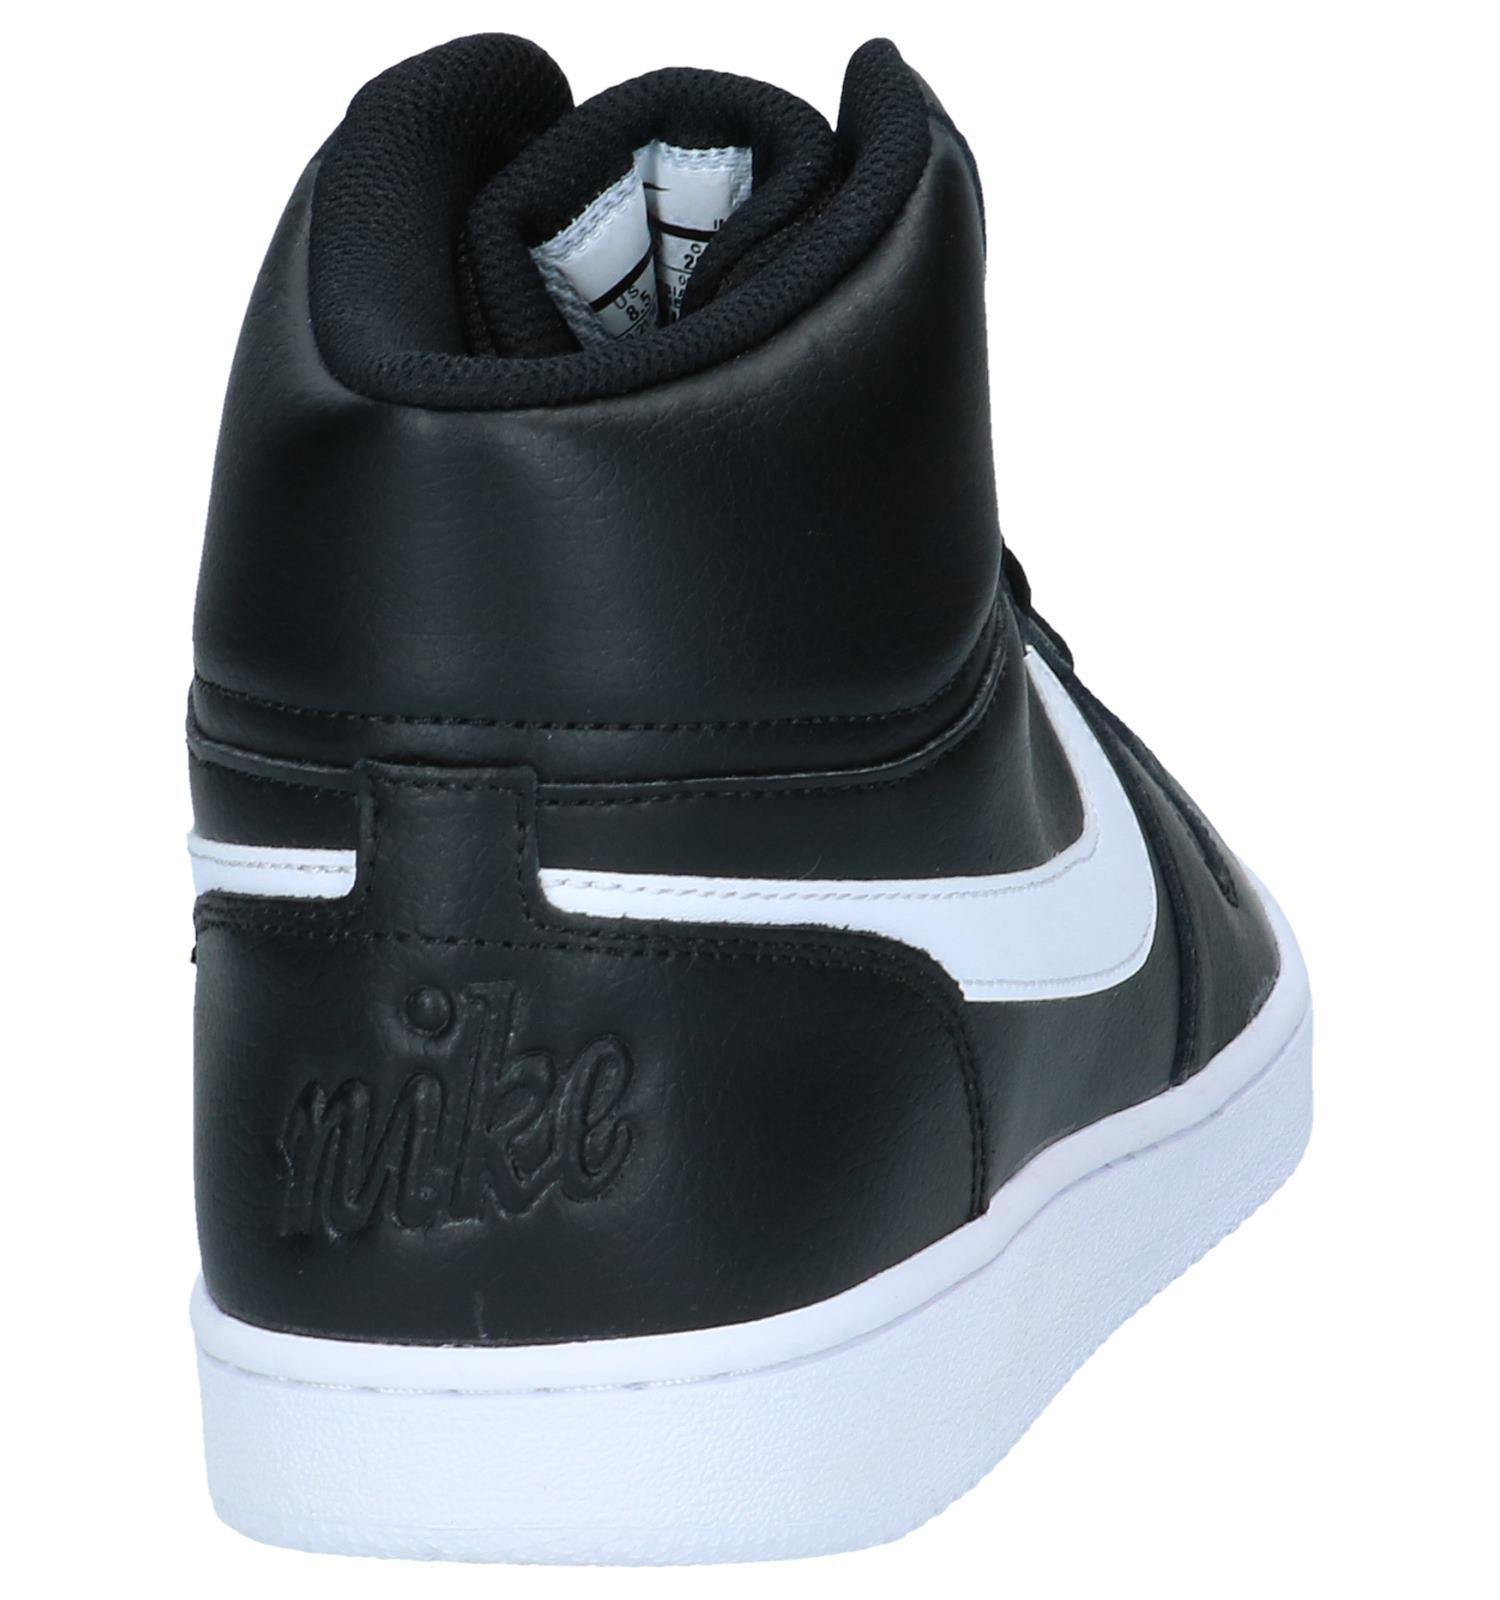 Zwarte Sneakers Nike Nike Sneakers Nike Zwarte Hoog Ebernon Hoog Ebernon Ebernon Zwarte nmvN80w